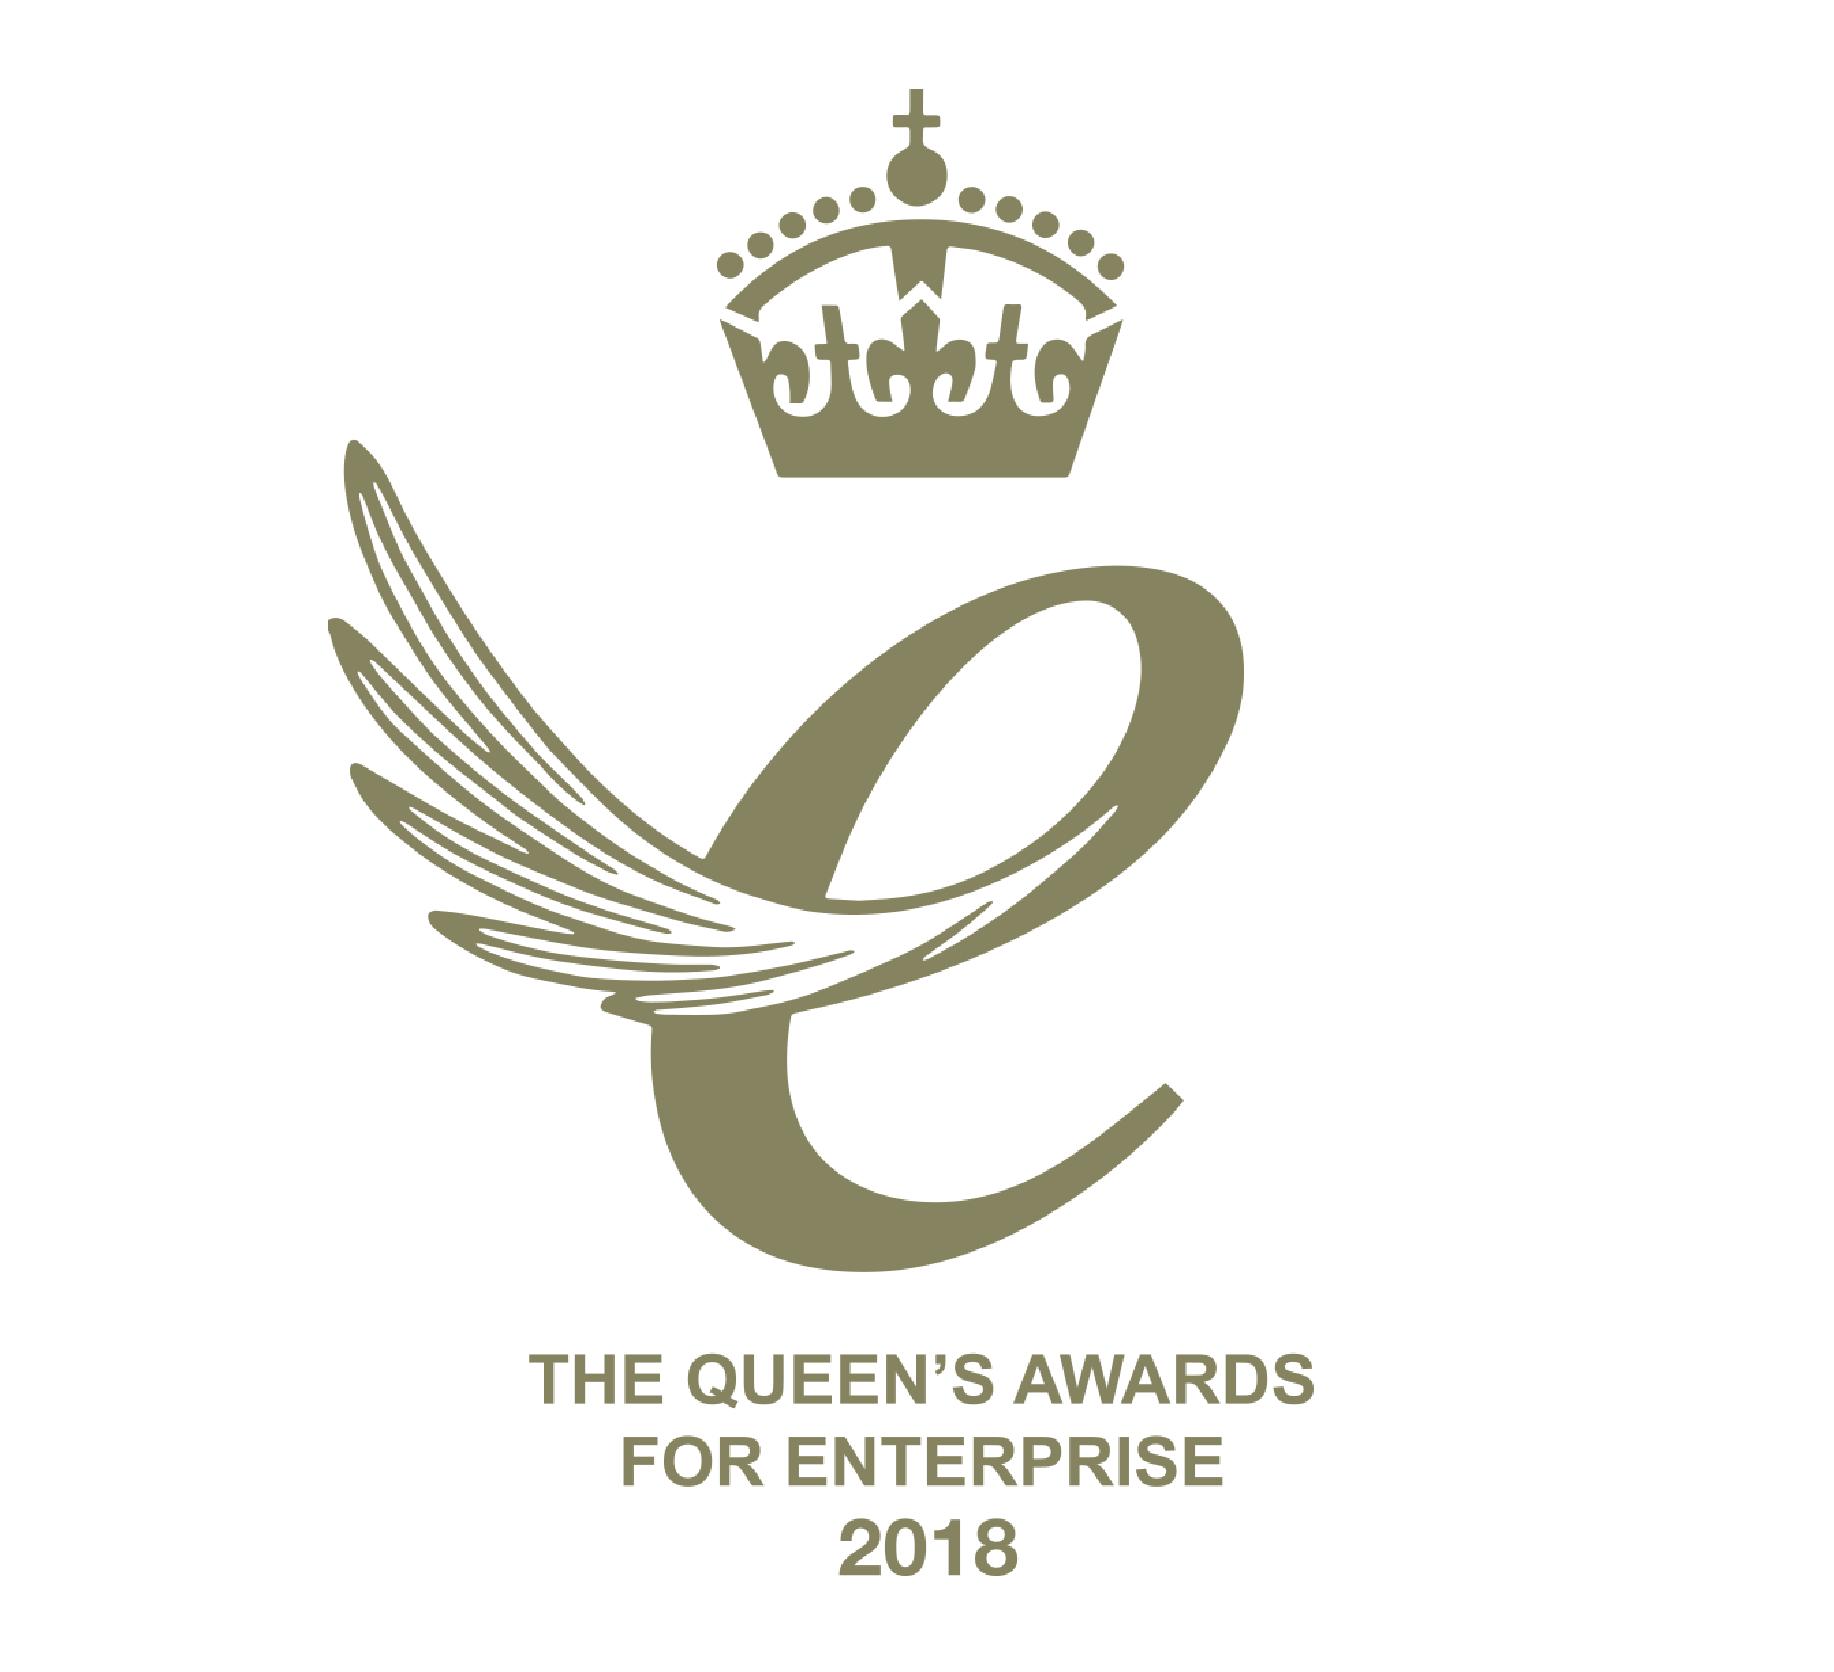 Queen's Award for Enterprise announce Gresham as a winner